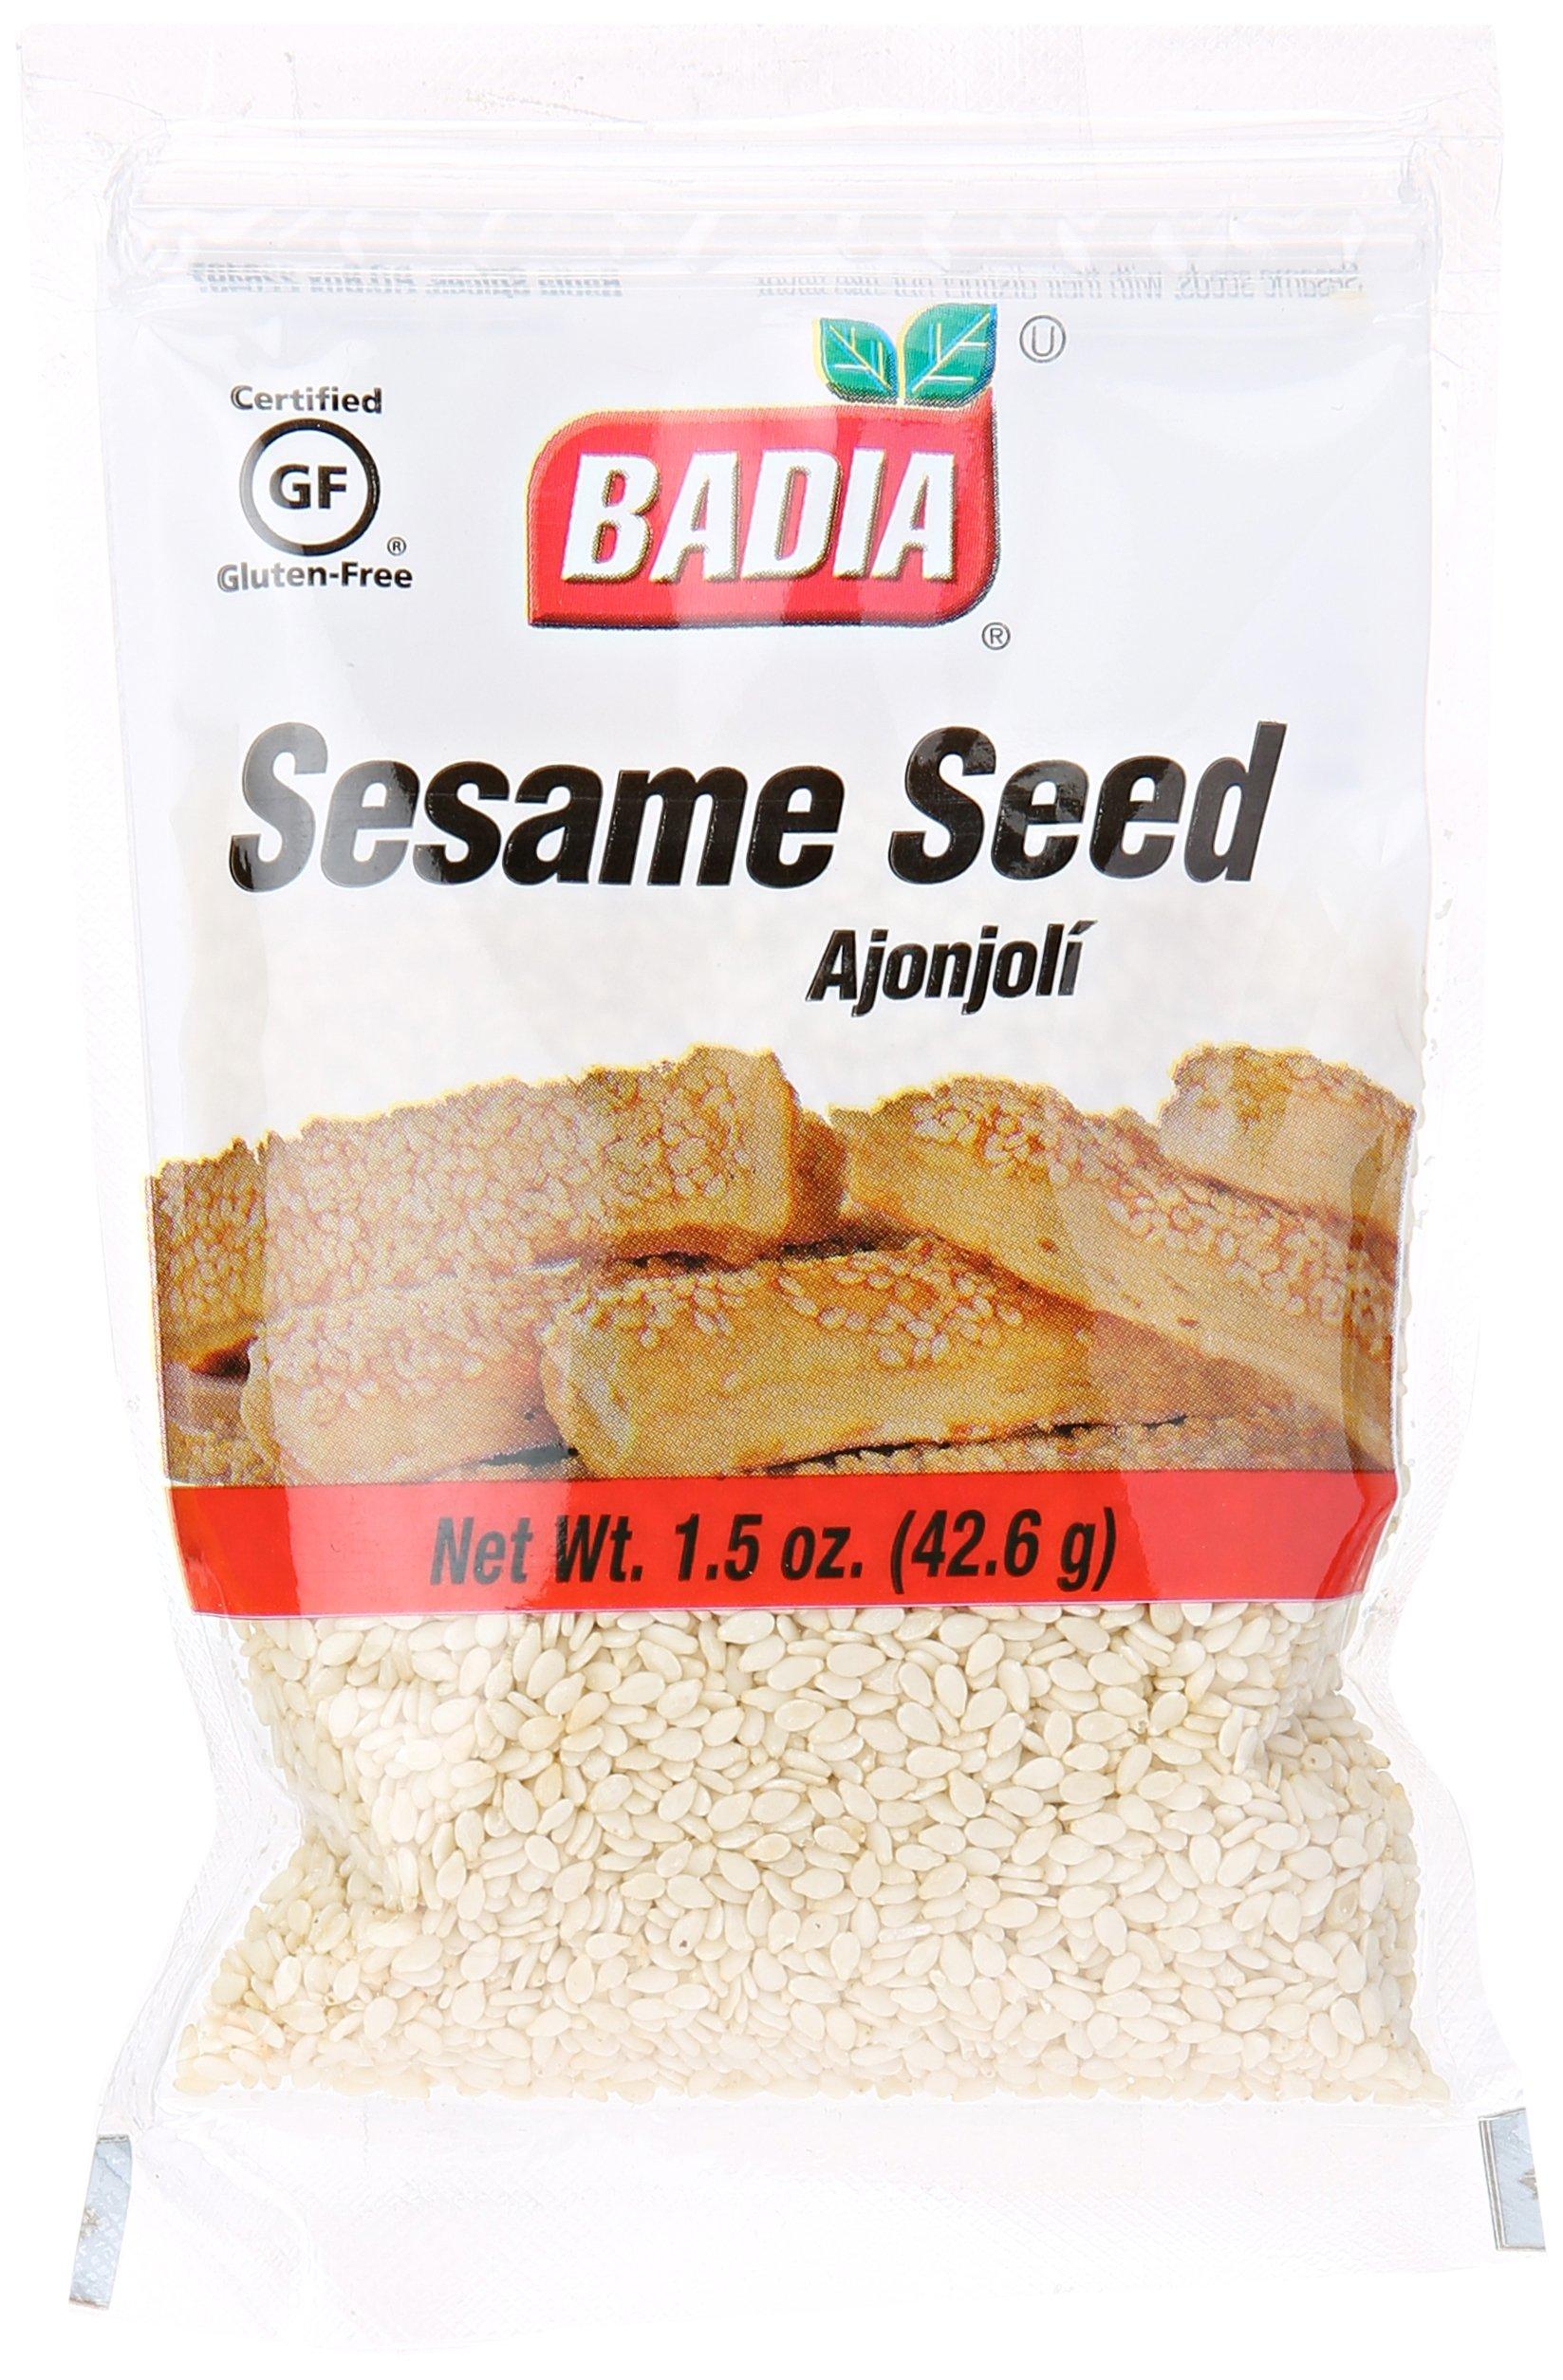 Badia Sesame Seed Packet, 1.5 oz